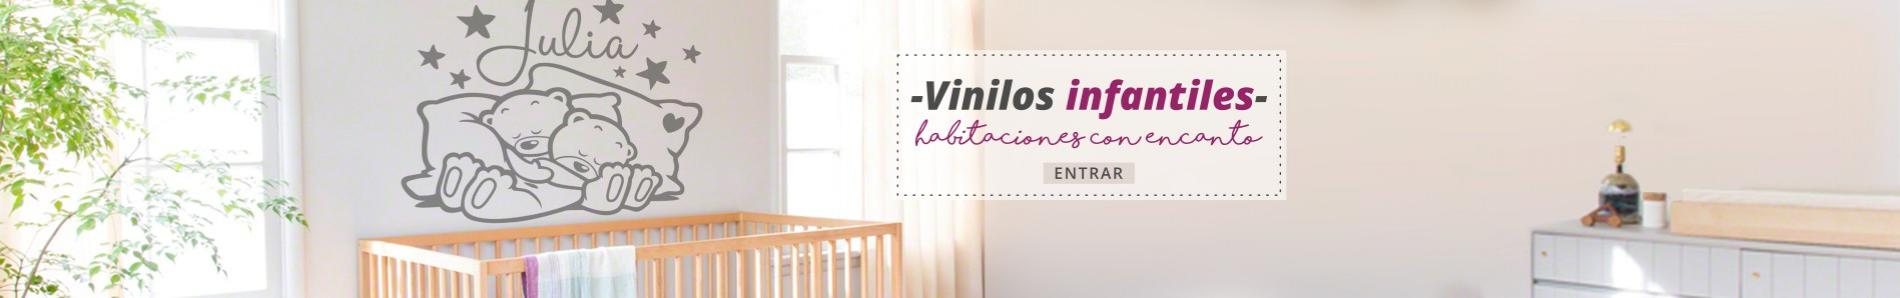 Comprar vinilos decorativos infantiles baratos online for Vinilos baratos online